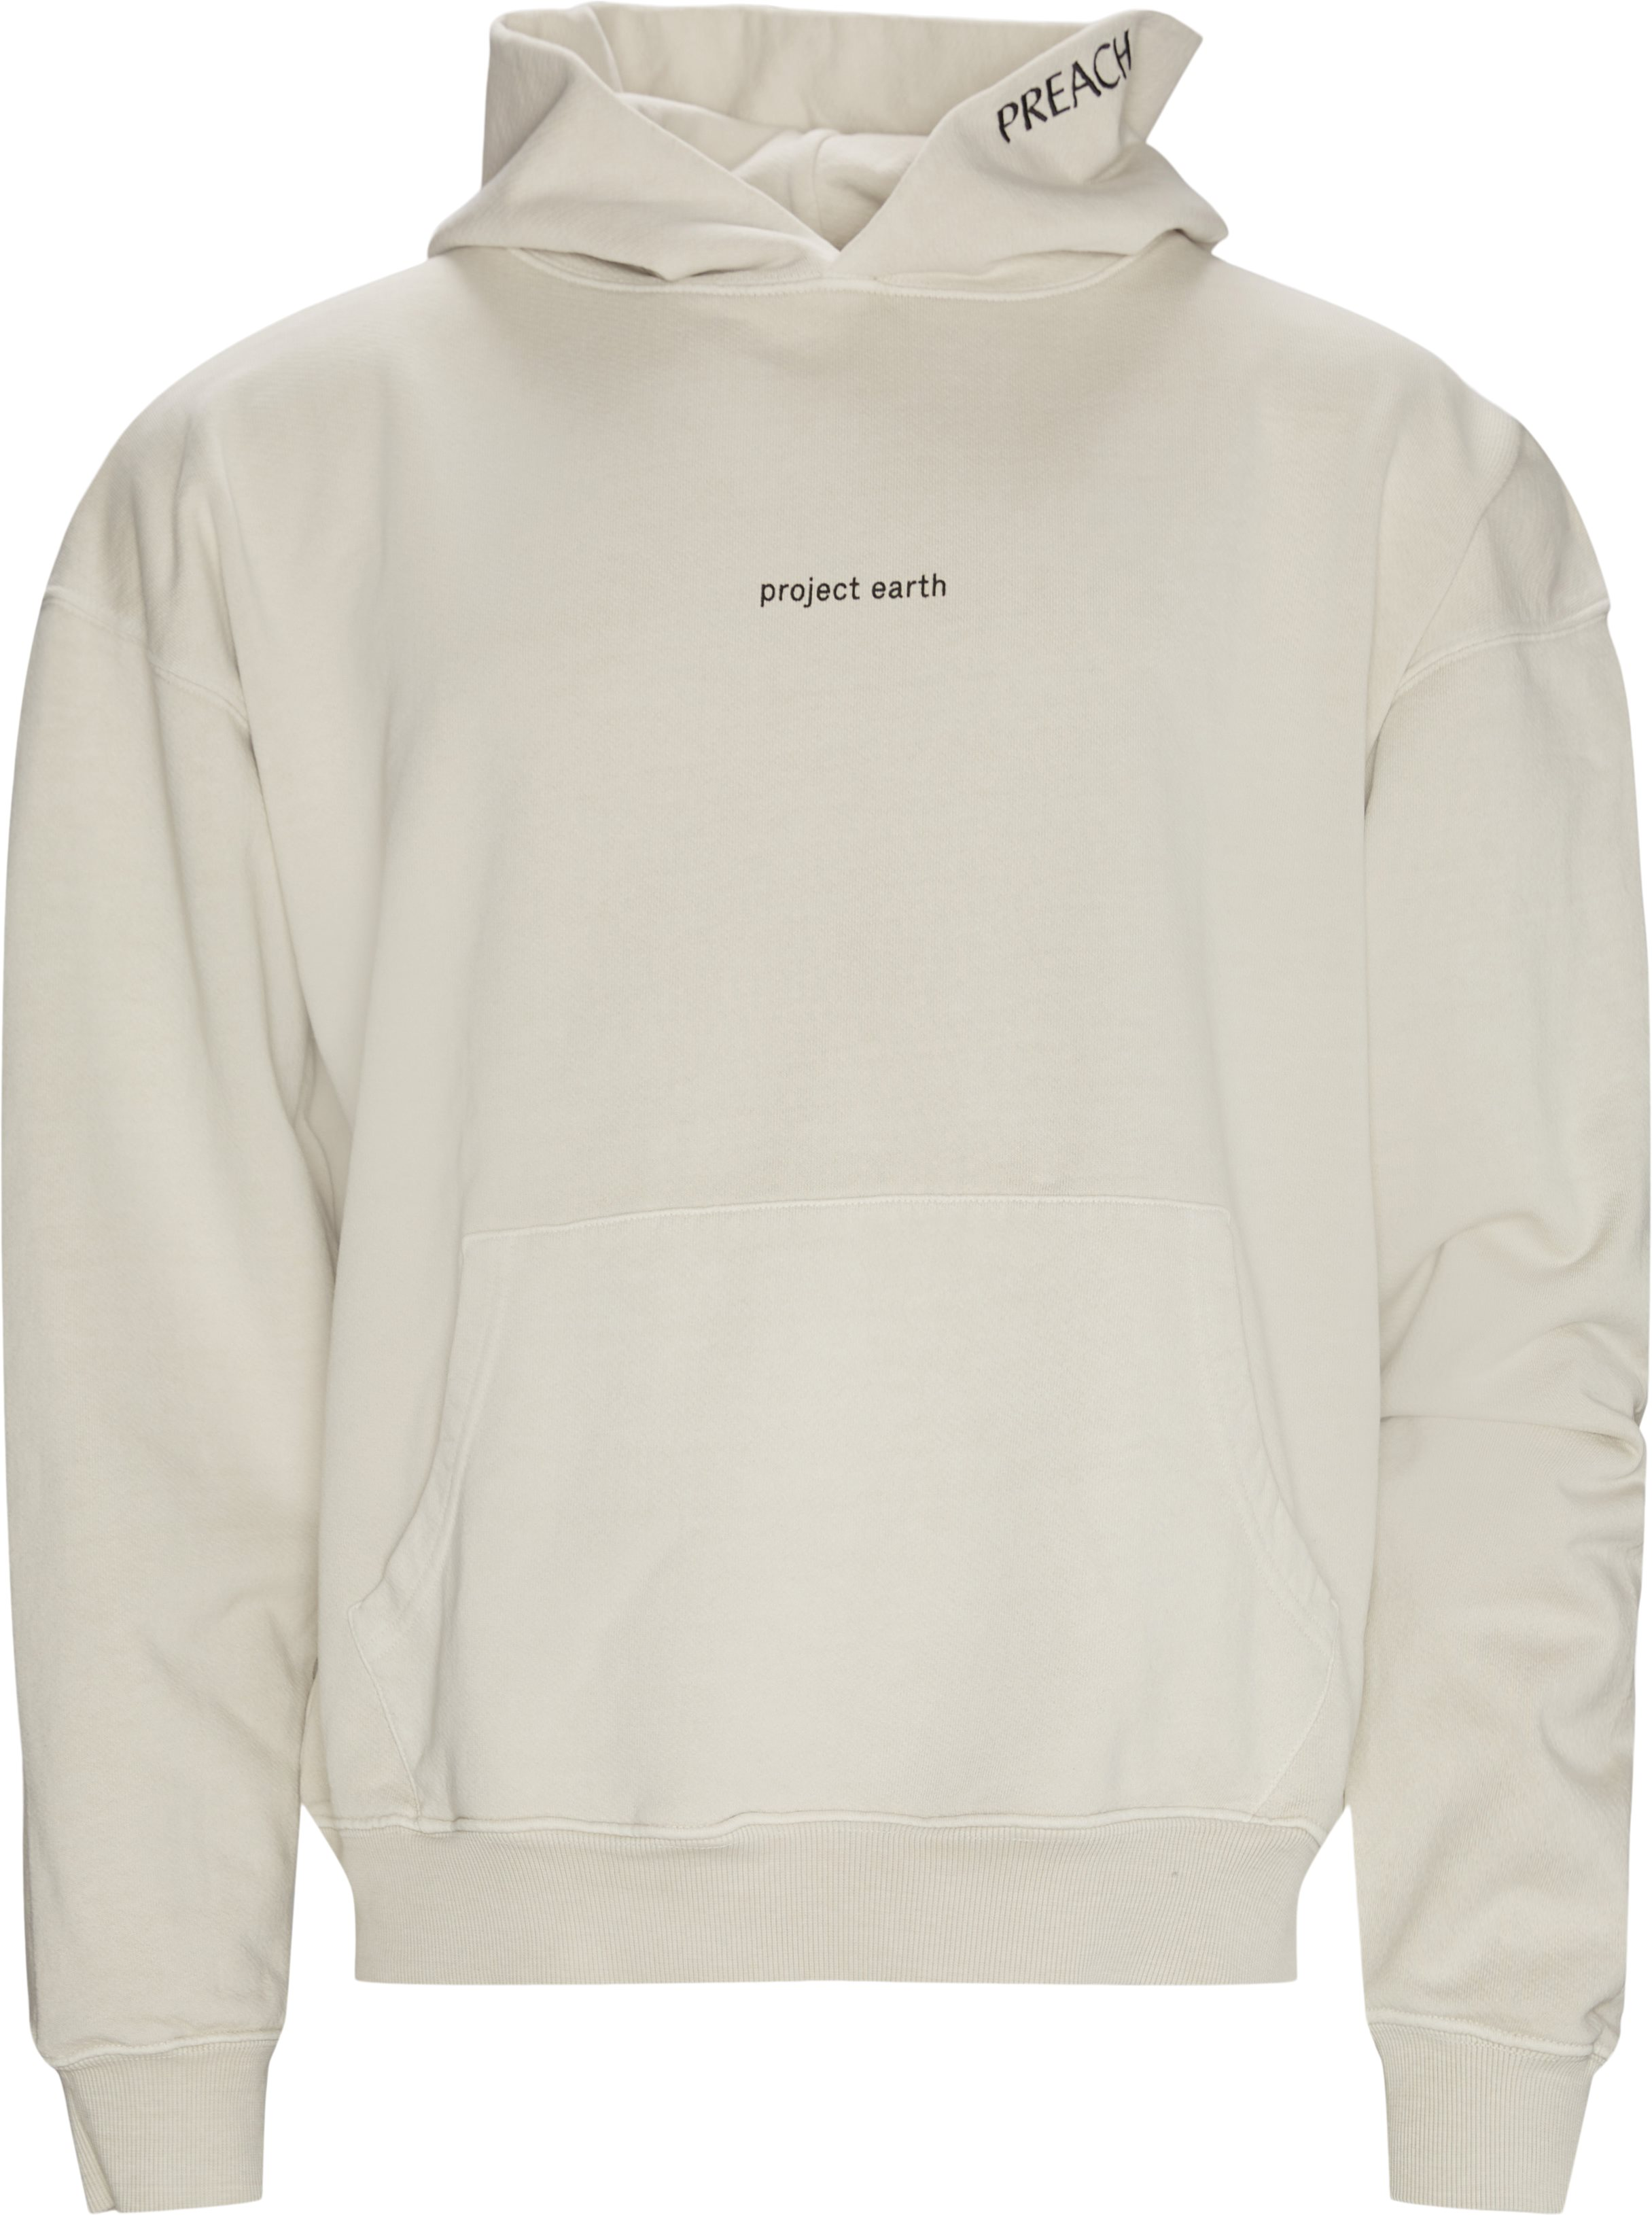 Oversized project earth hoodie - Sweatshirts - Oversize fit - Hvid